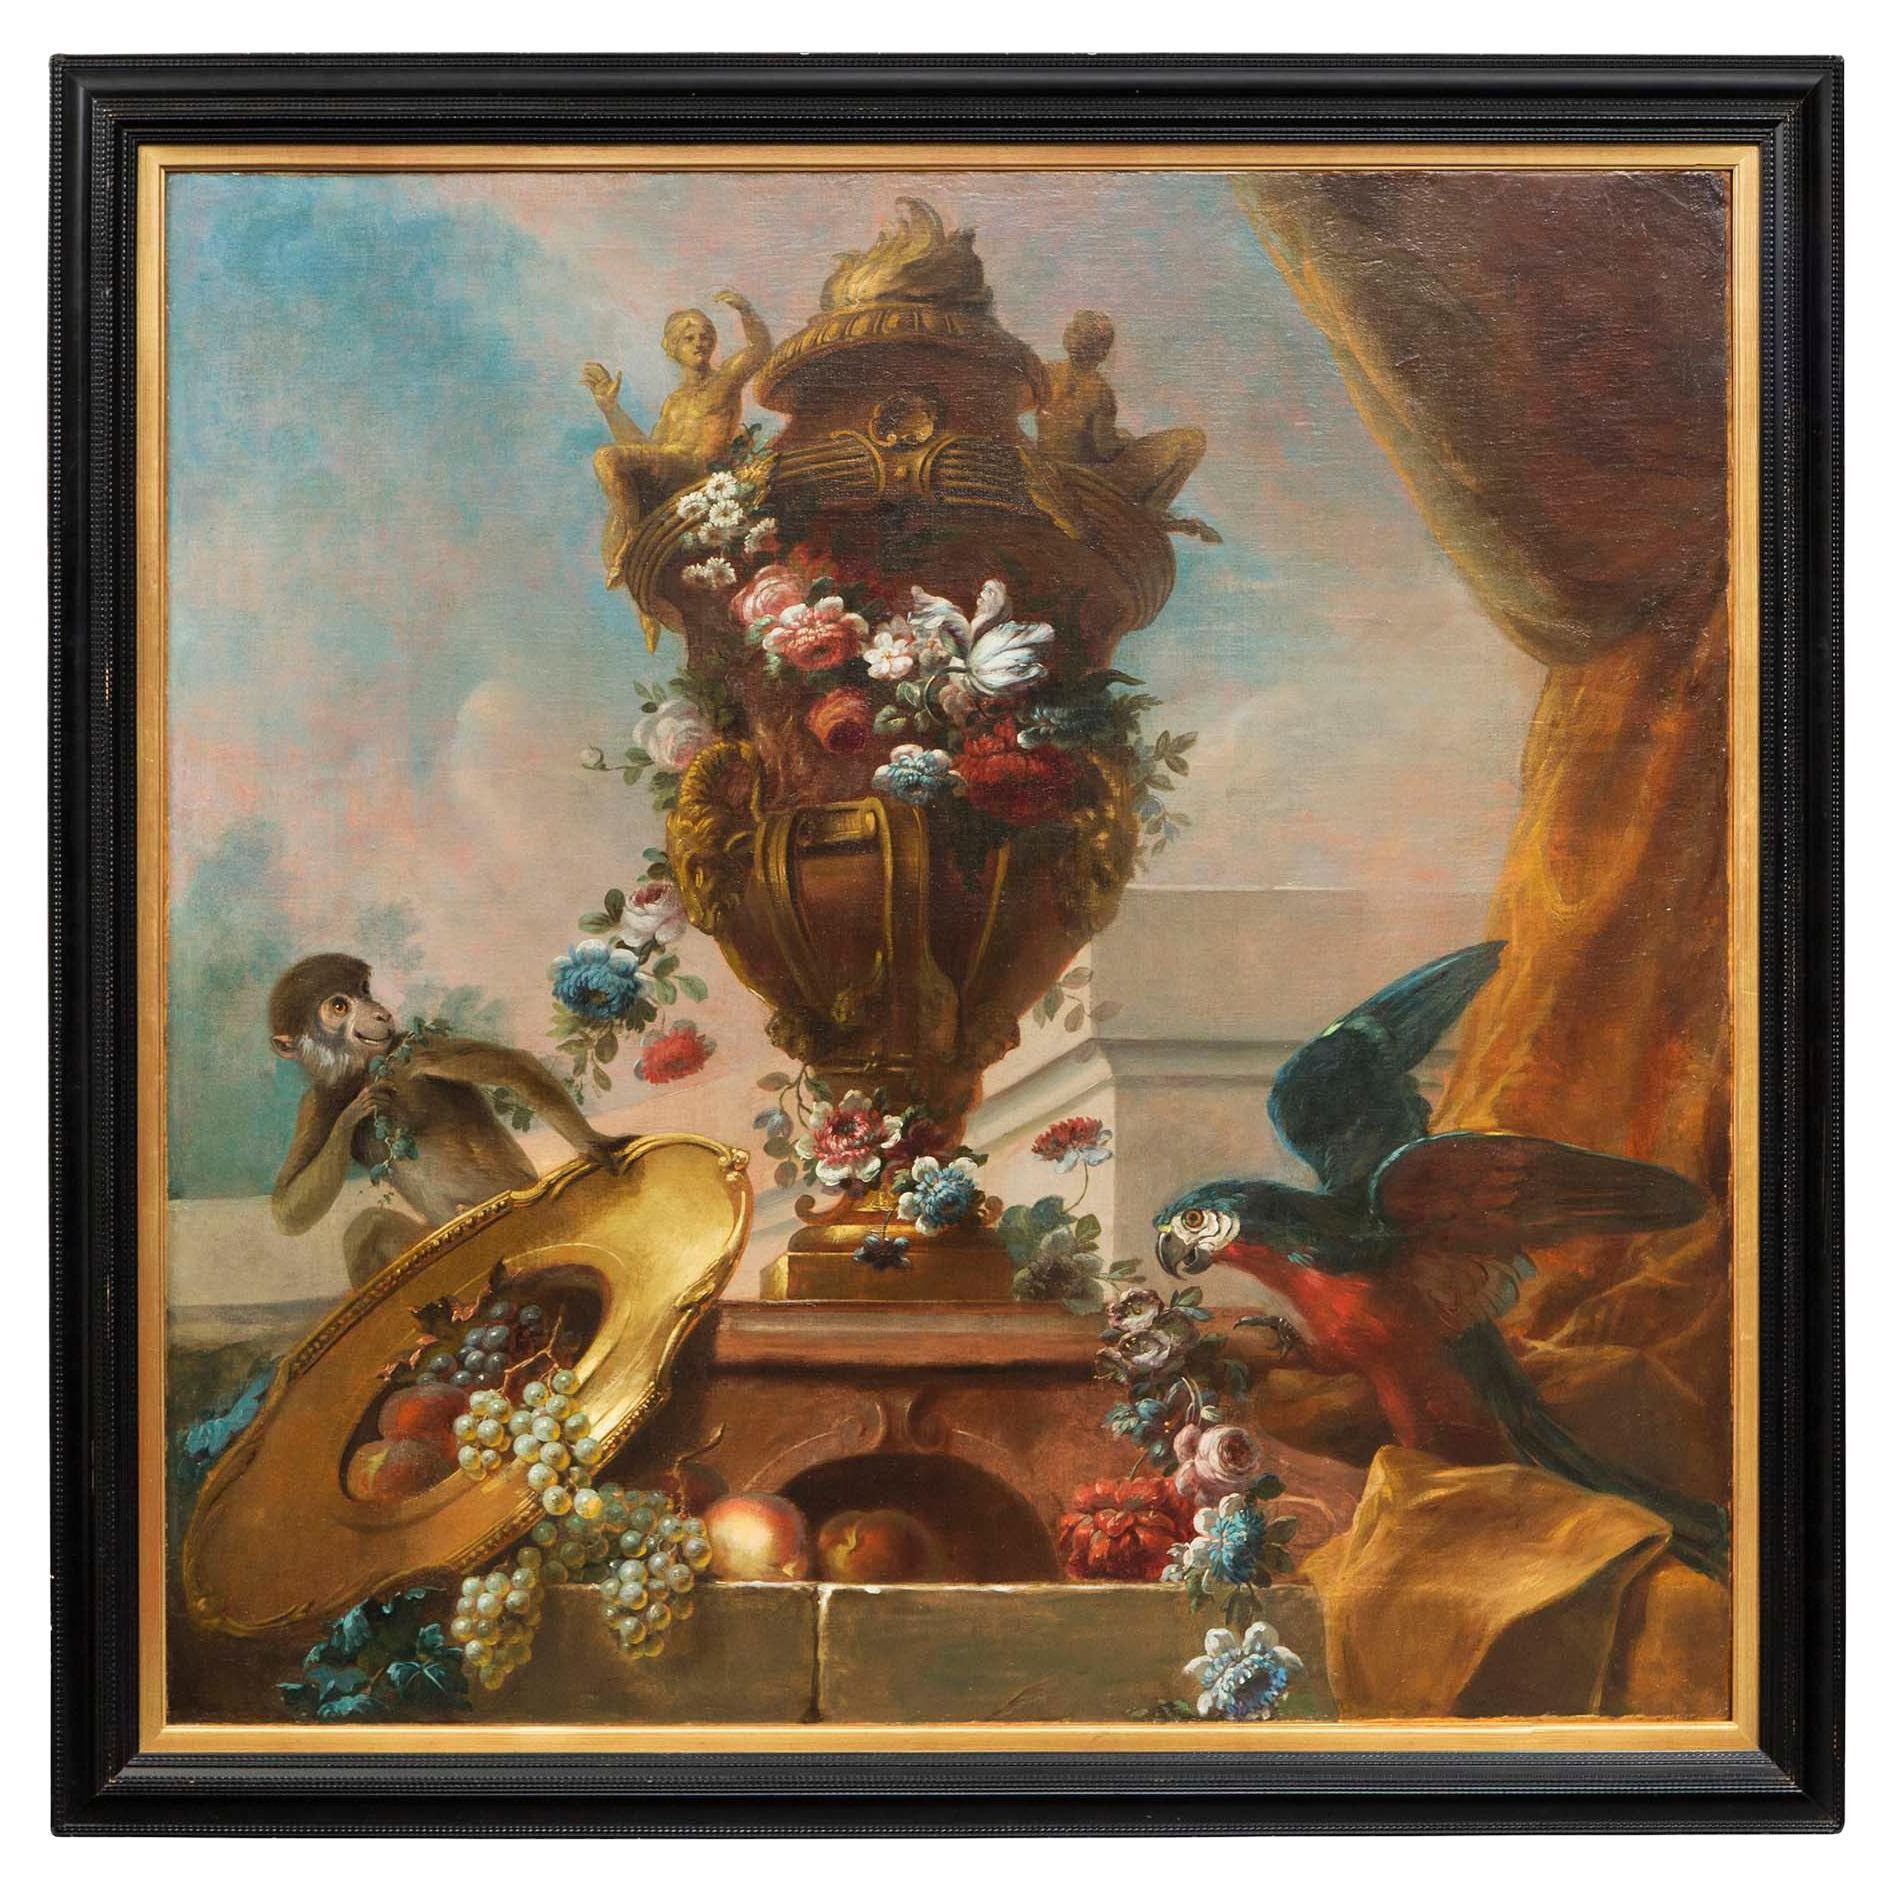 Continental 19th Century Still Life Painting